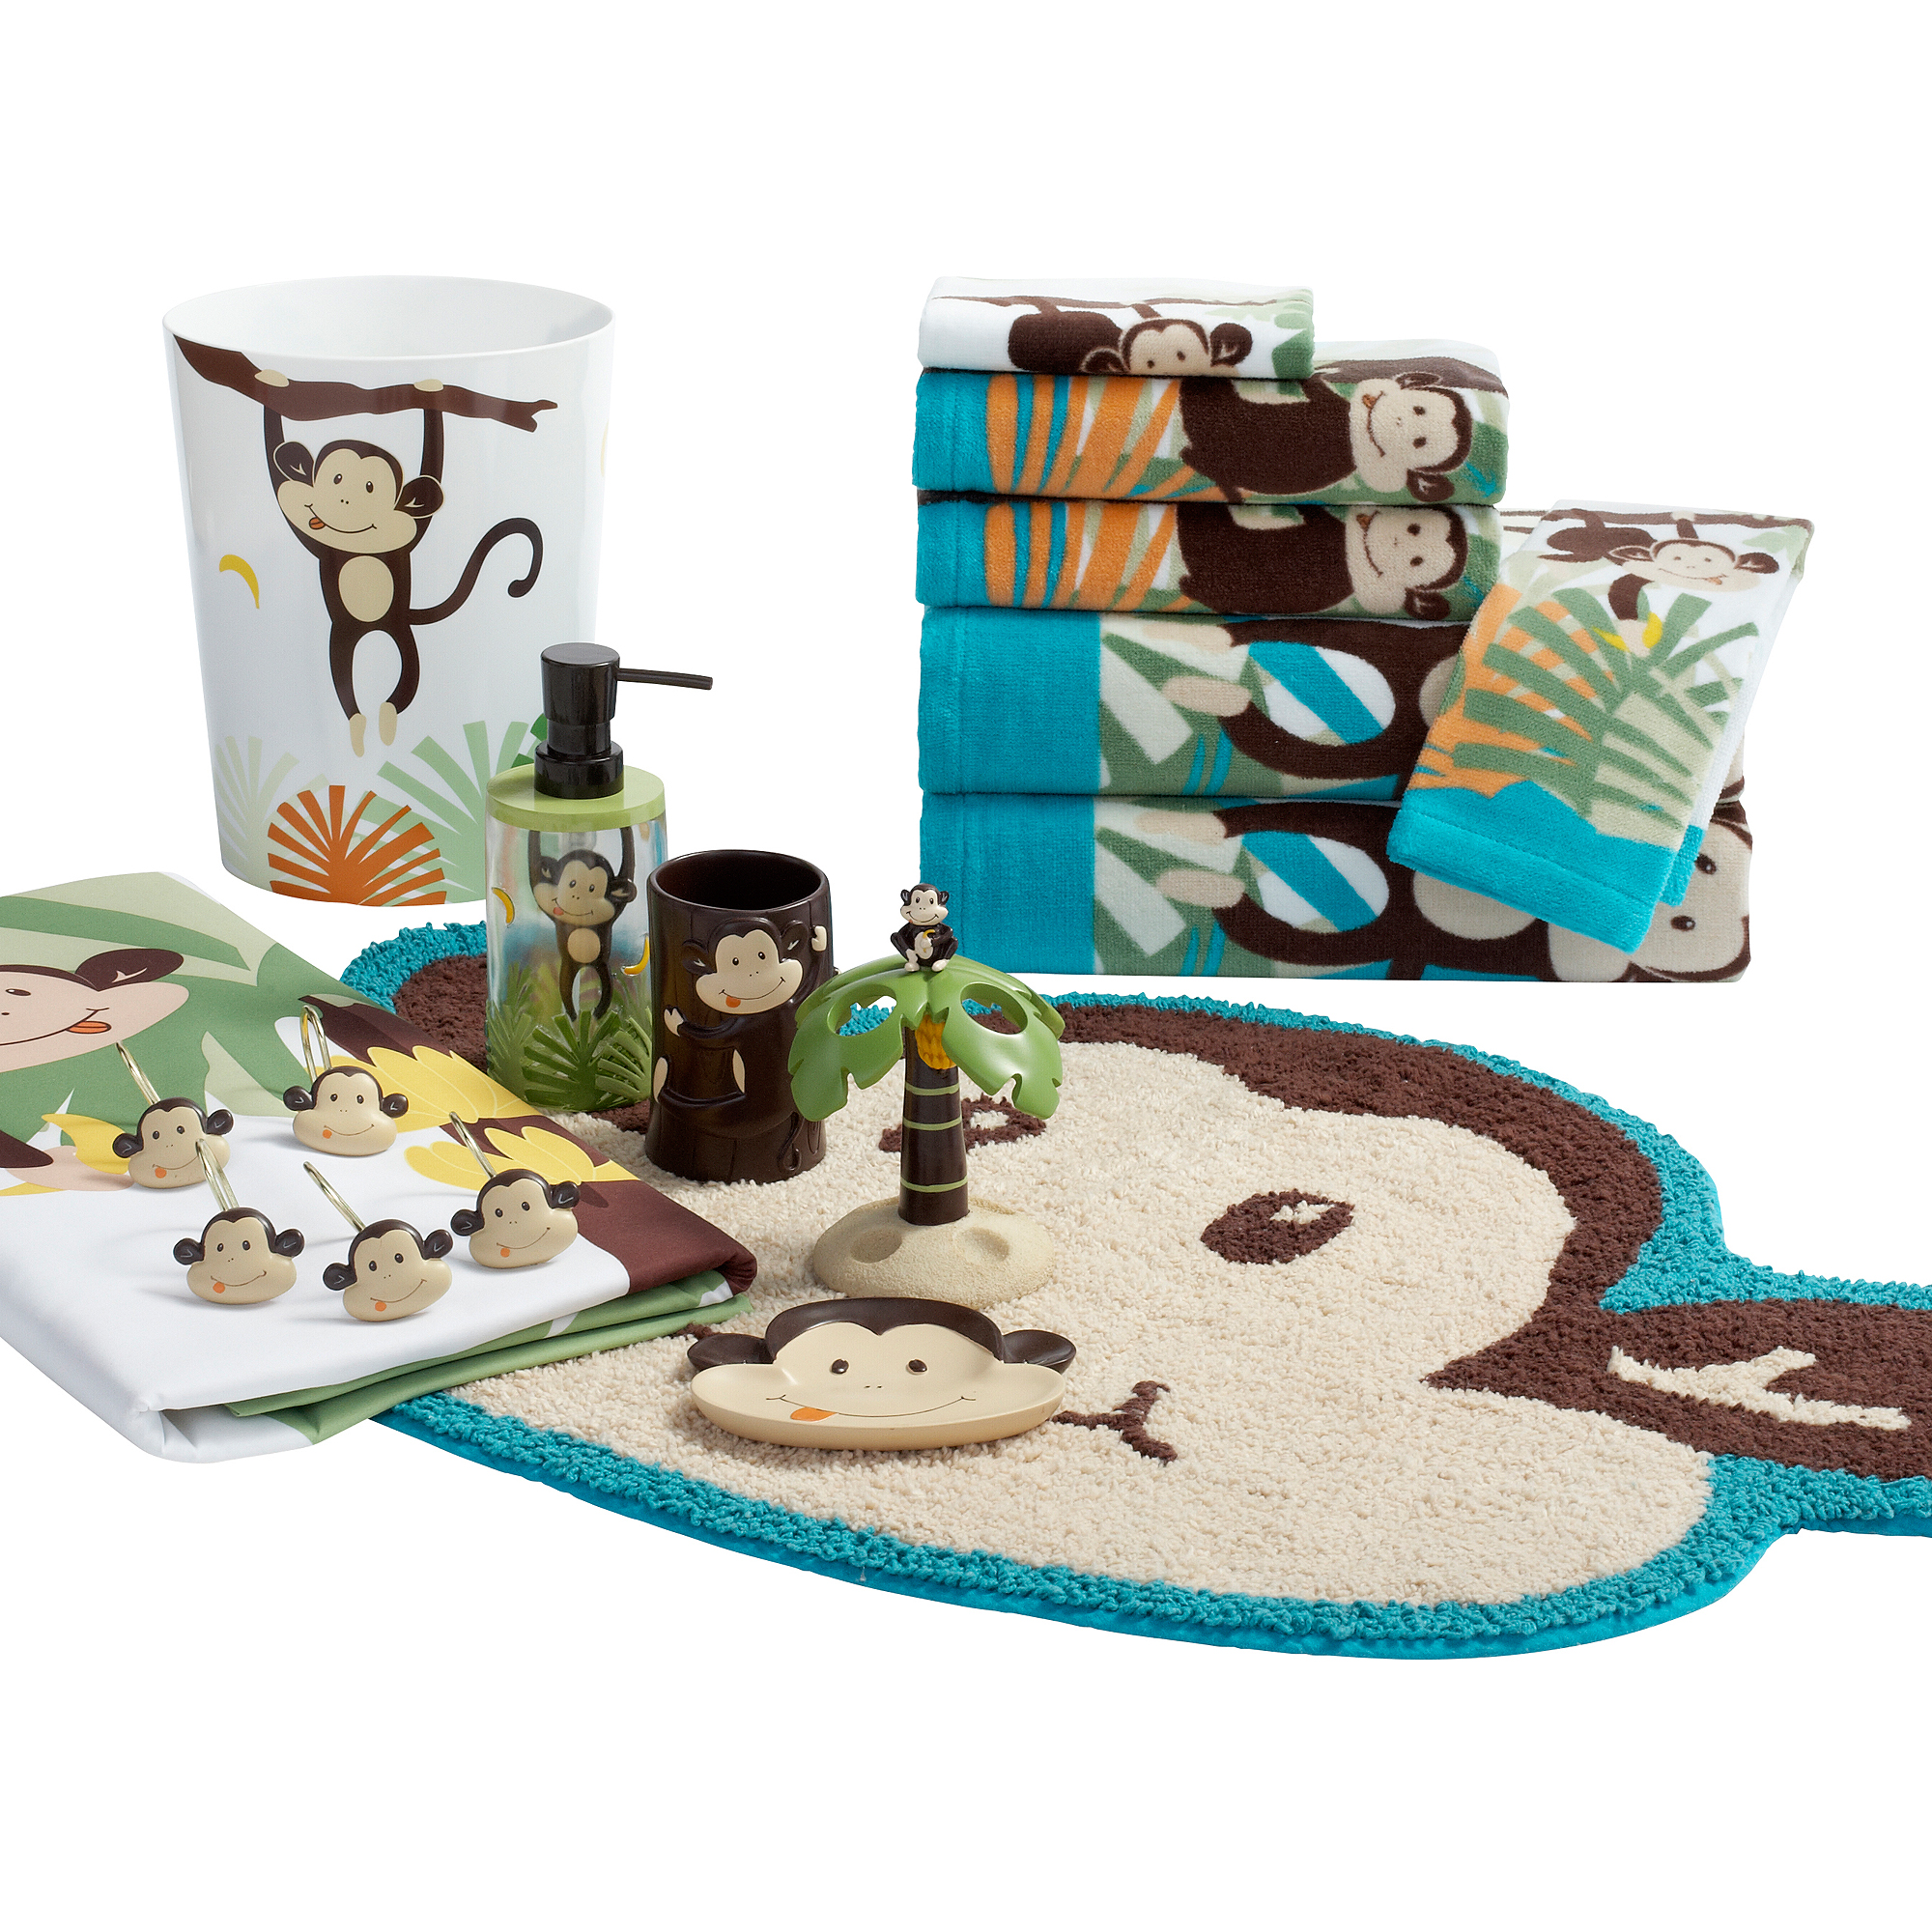 Spongebob Squarepants Bathroom Accessories Home Design ヅヅ Nice .